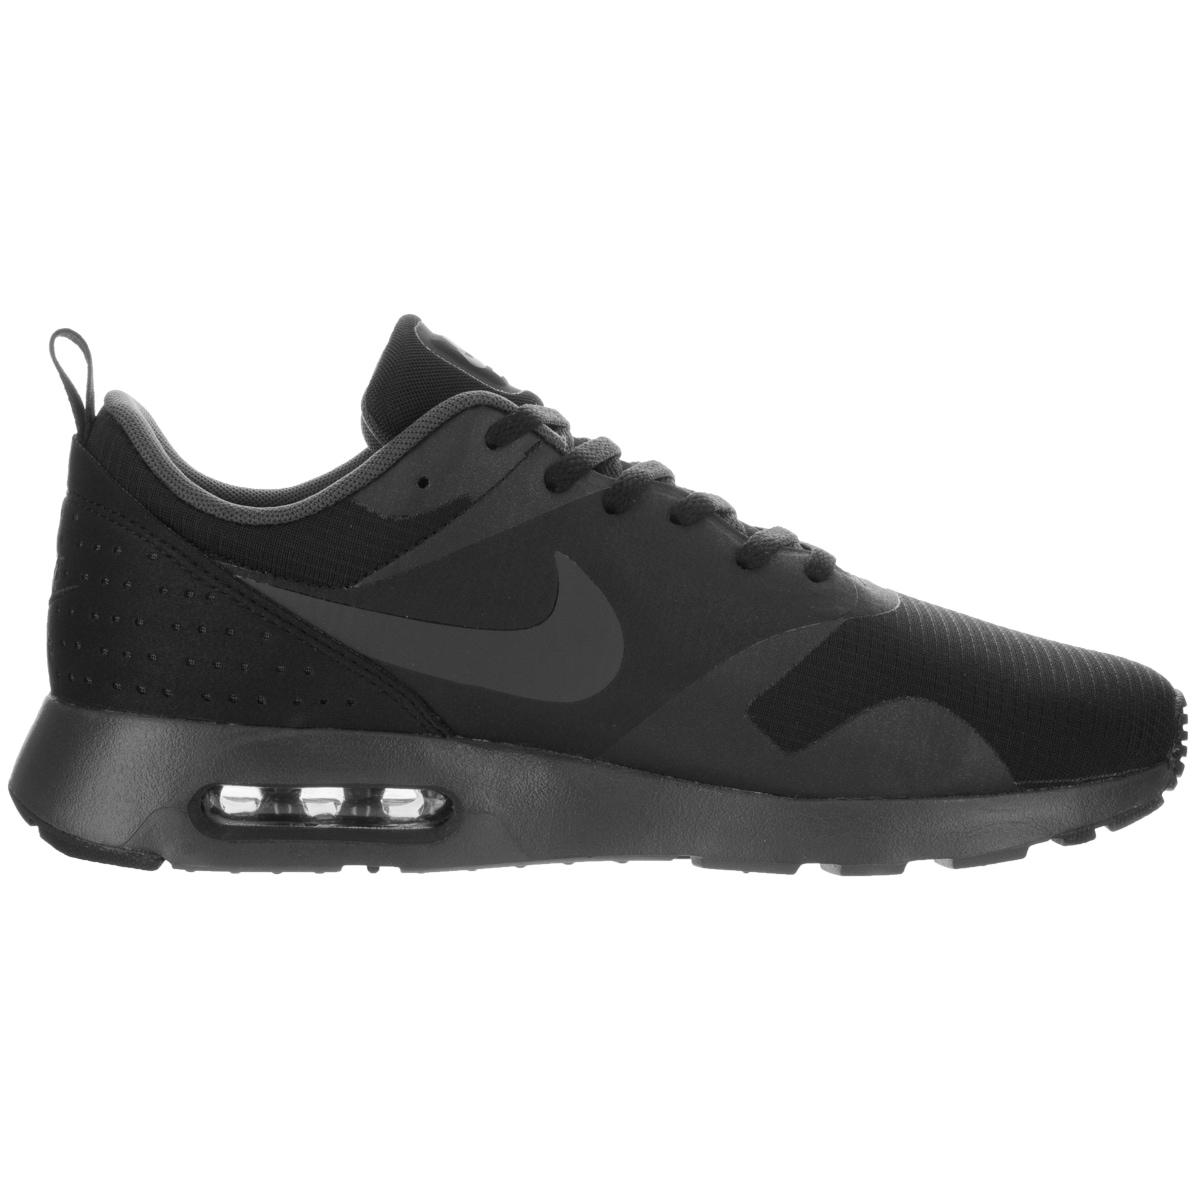 7cca2a1497 Nike-Mens-Air-Max -Tavas-Black-Anthracite-Black-Running-Shoe-Size-10-f215f135-b26b-4088-b078-31af95f22c2a.jpg